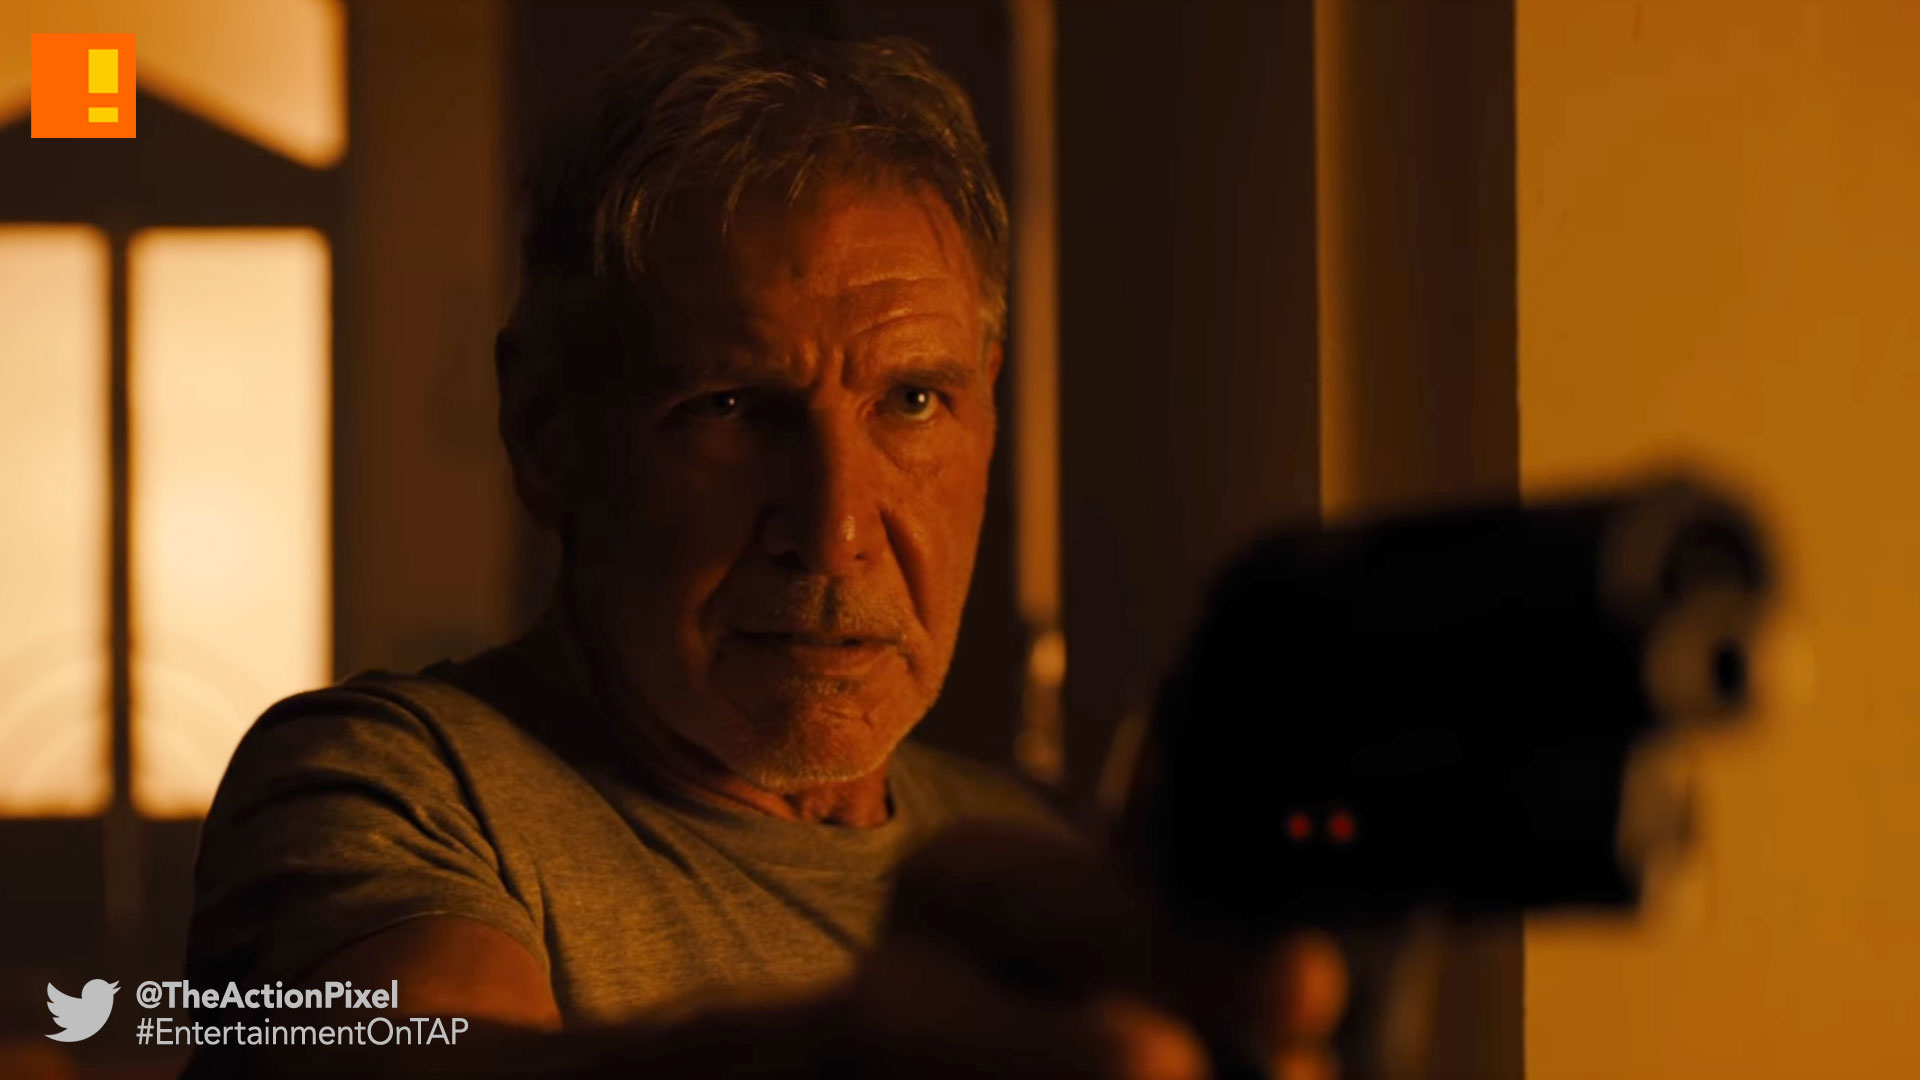 blade runner 2049, ryan gosling, harrison ford, trailer, sony, columbia, icon, warner bros. entertainment , the action pixel, entertainment on tap, rick deckard,